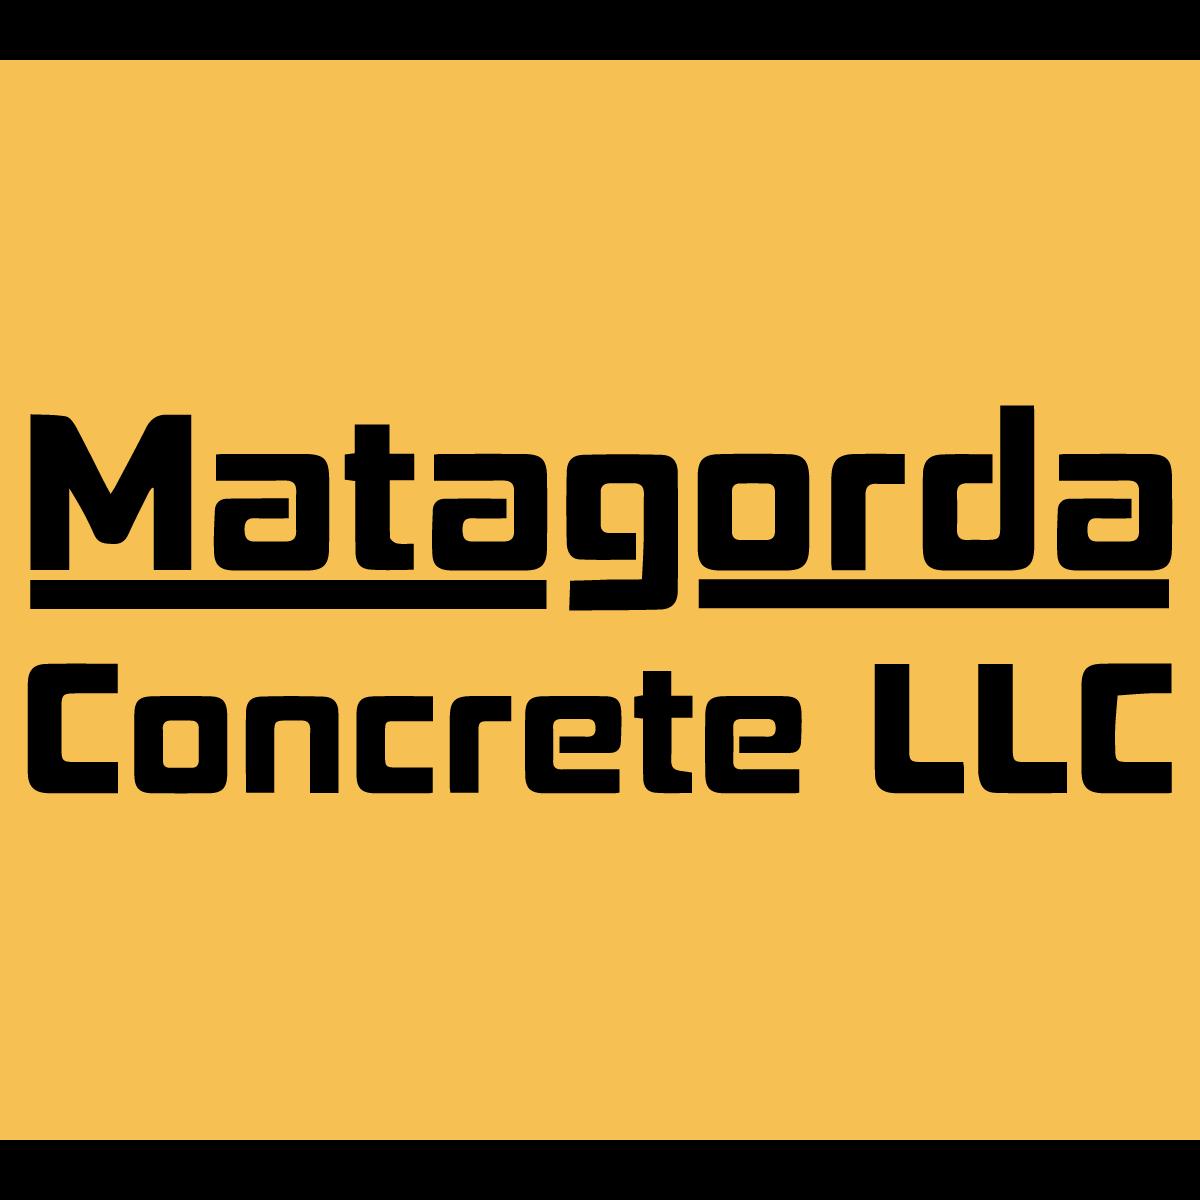 Matagorda Concrete LLC